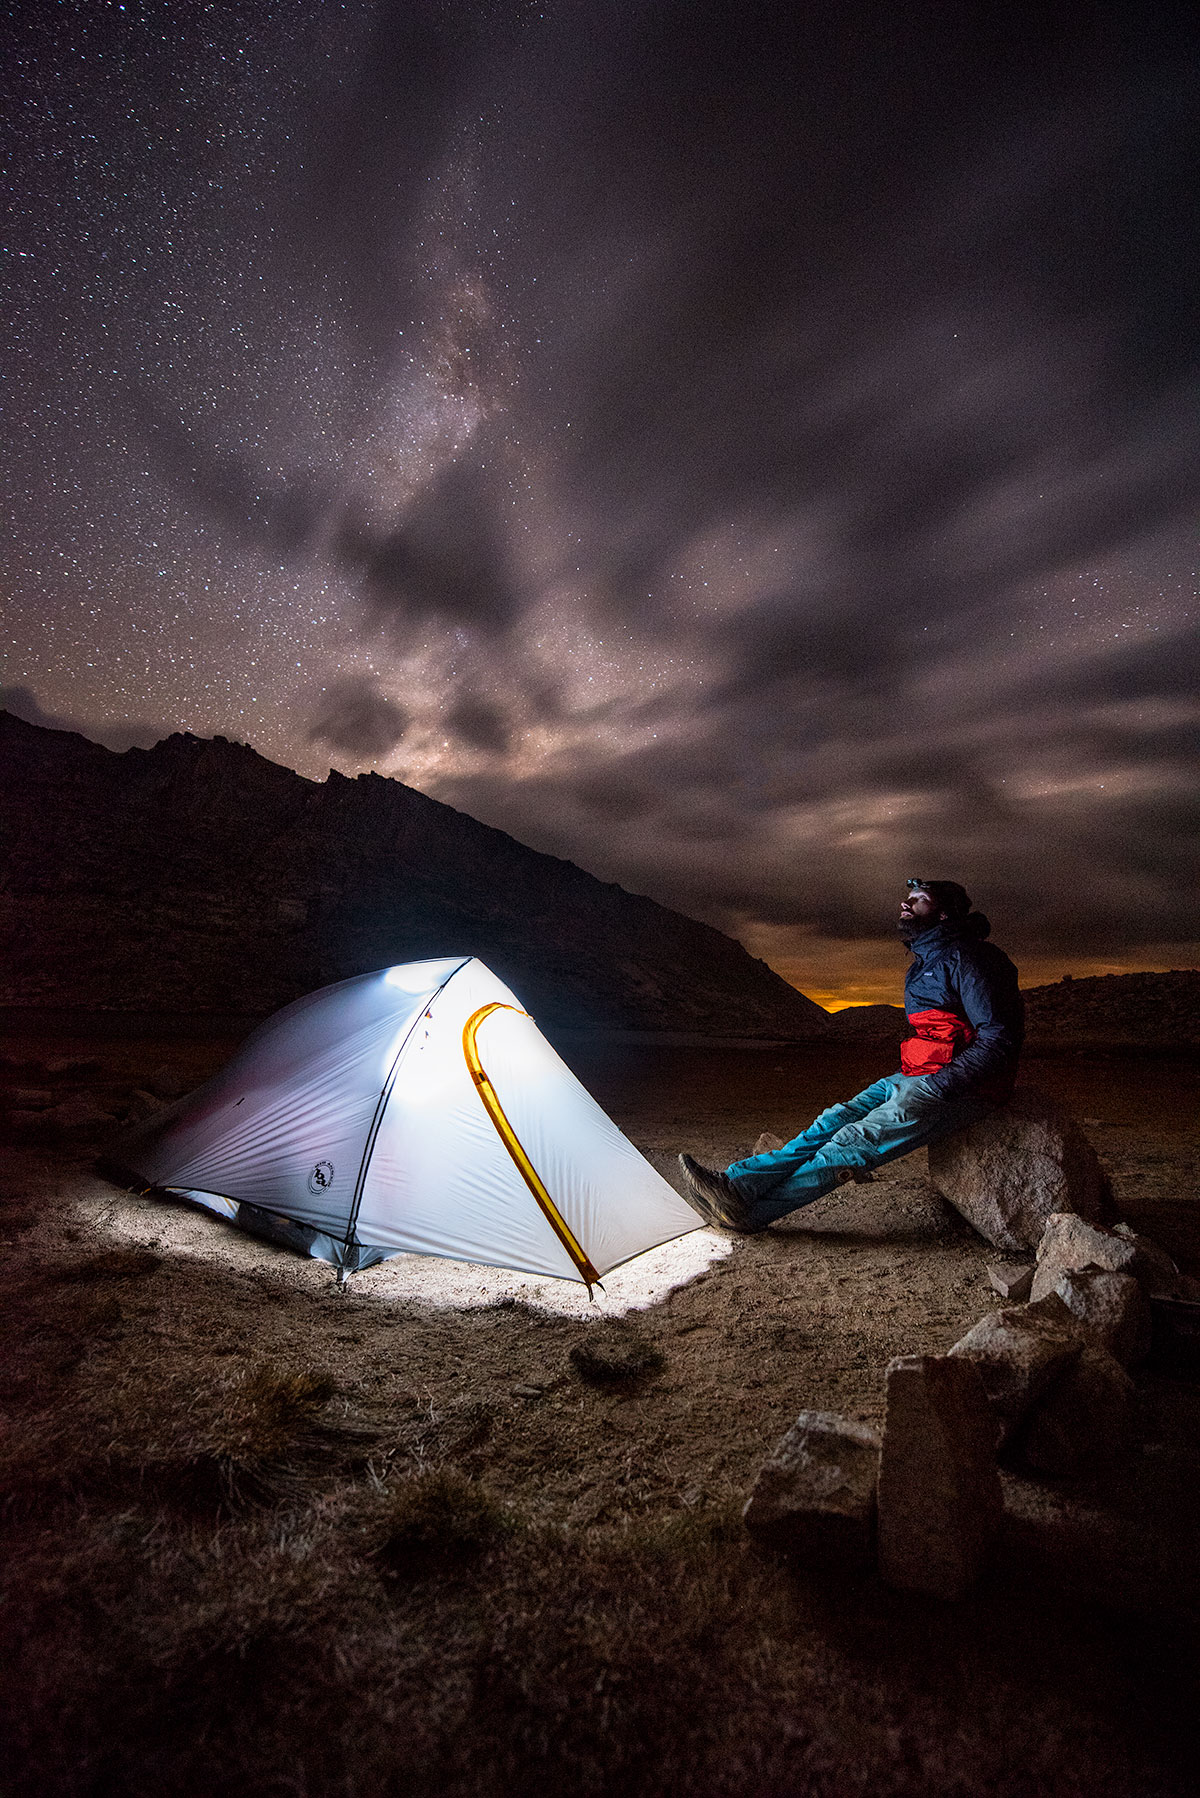 austin-trigg-big-agnes-tent-john-muir-trail-camping-Night-FlyCreek2-milky-way-long-exposure.jpg